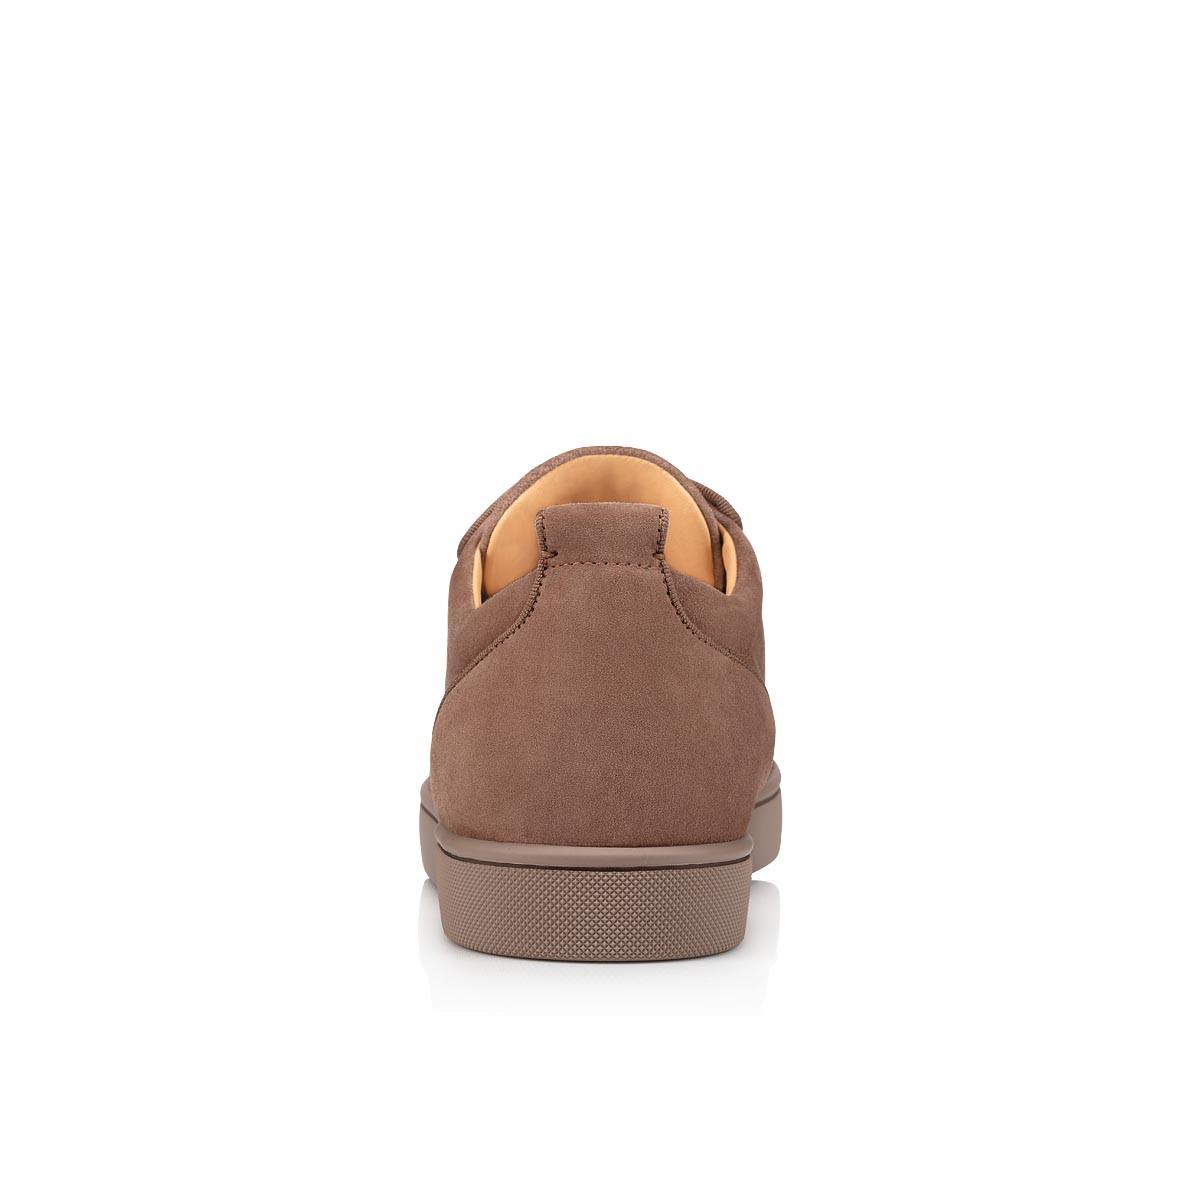 Shoes - Louis Junior Spikes Orlato Flat - Christian Louboutin